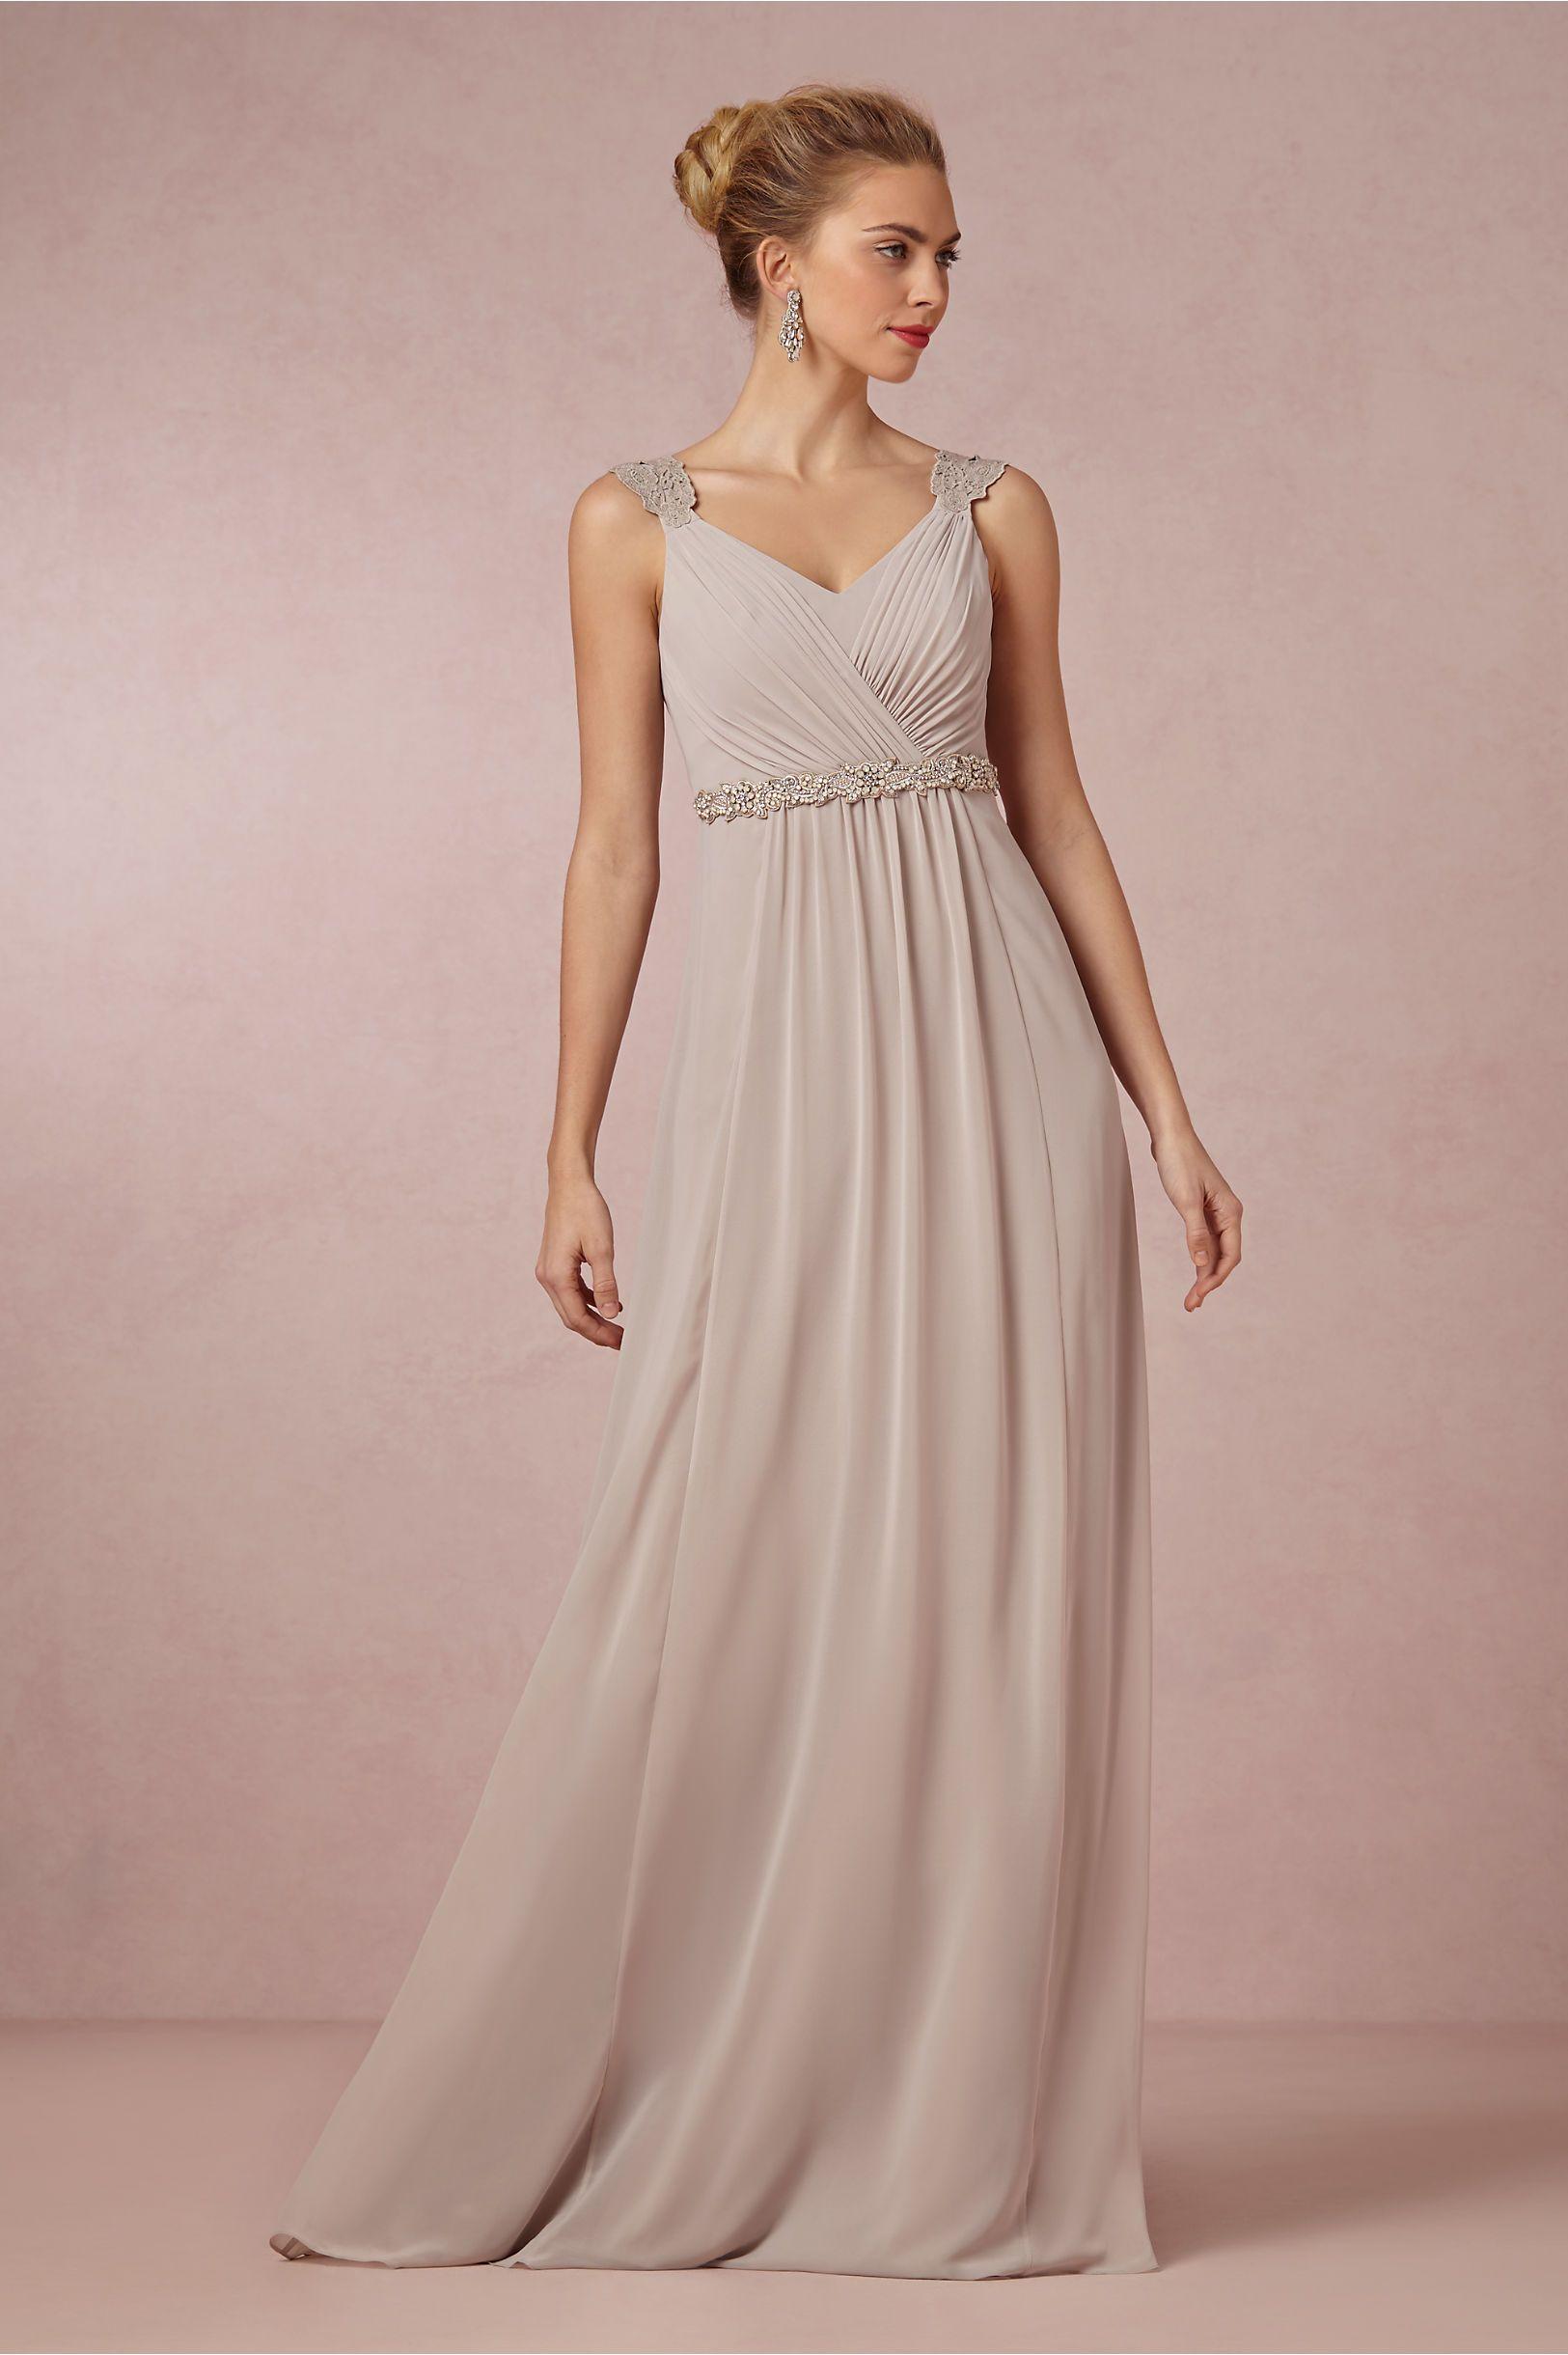 Freya maxi dress from bhldn the ultimate blush champagne for Beach wedding bridesmaid dresses pinterest